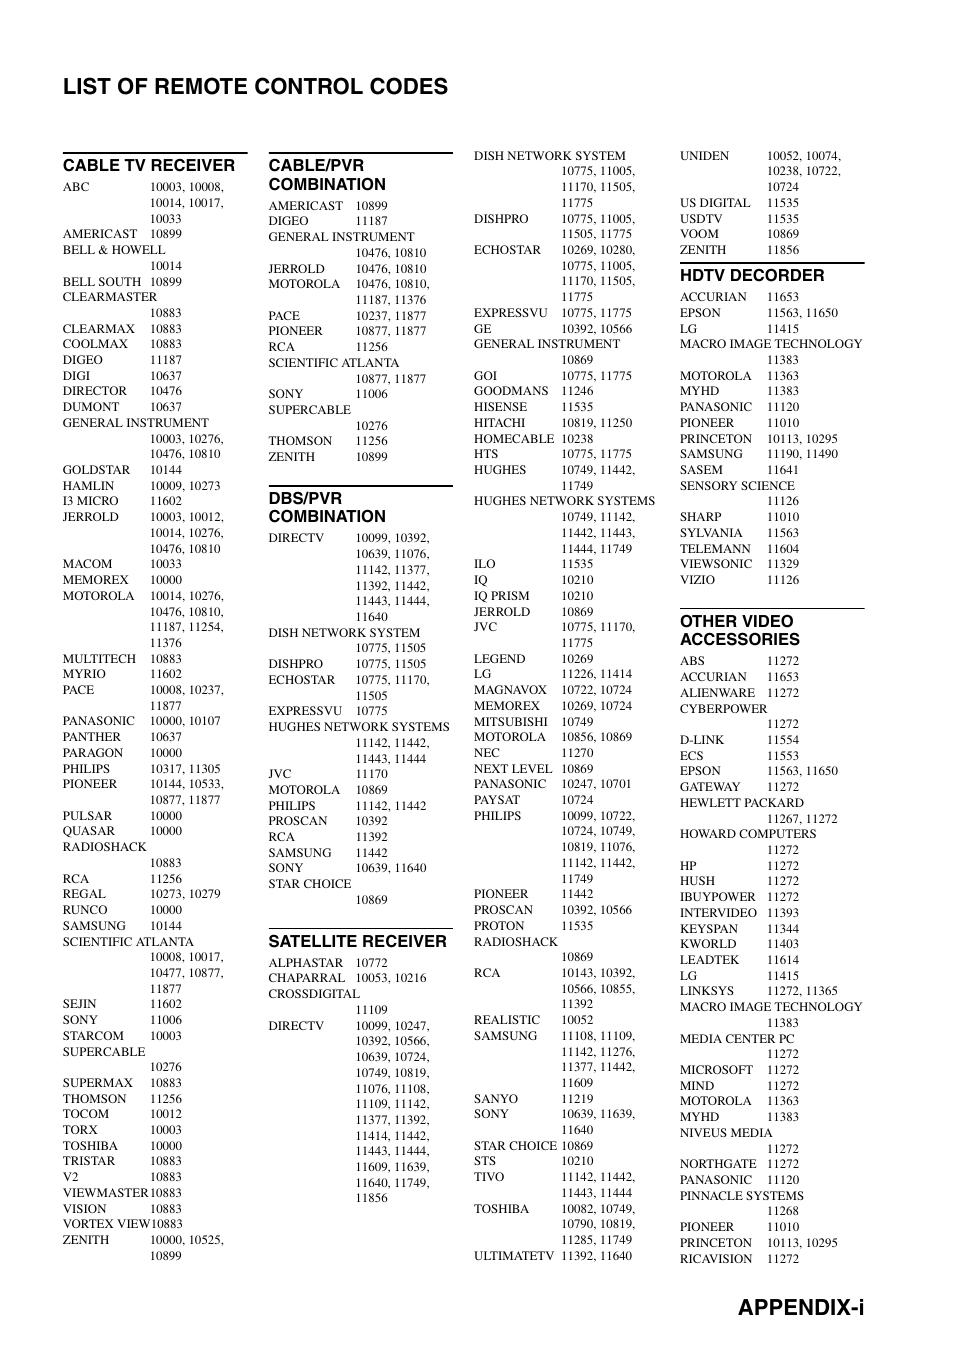 List of remote control codes, Appendix-i list of remote